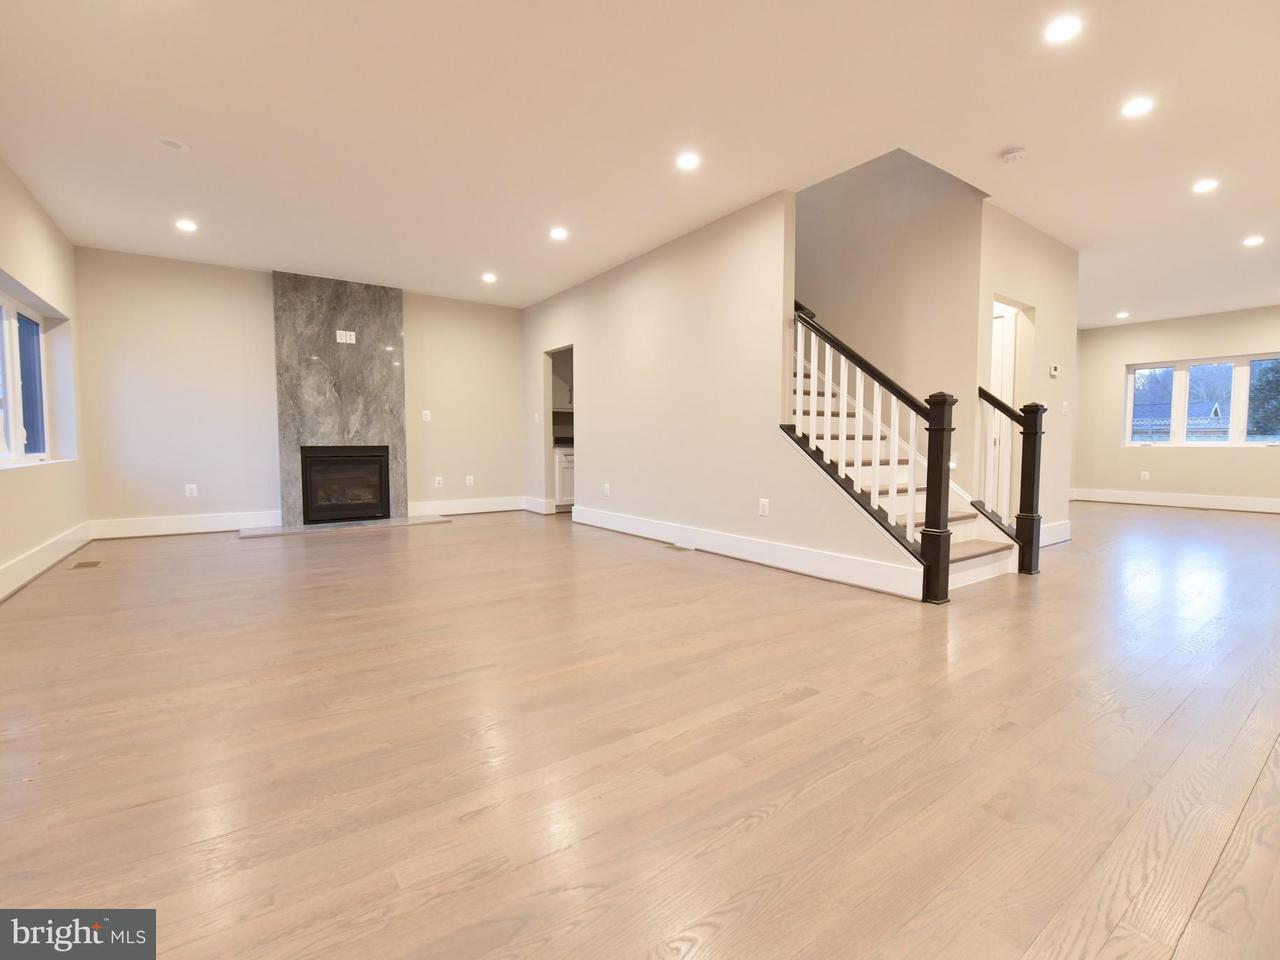 Additional photo for property listing at 213 W Greenway Blvd 213 W Greenway Blvd Falls Church, 弗吉尼亞州 22046 美國